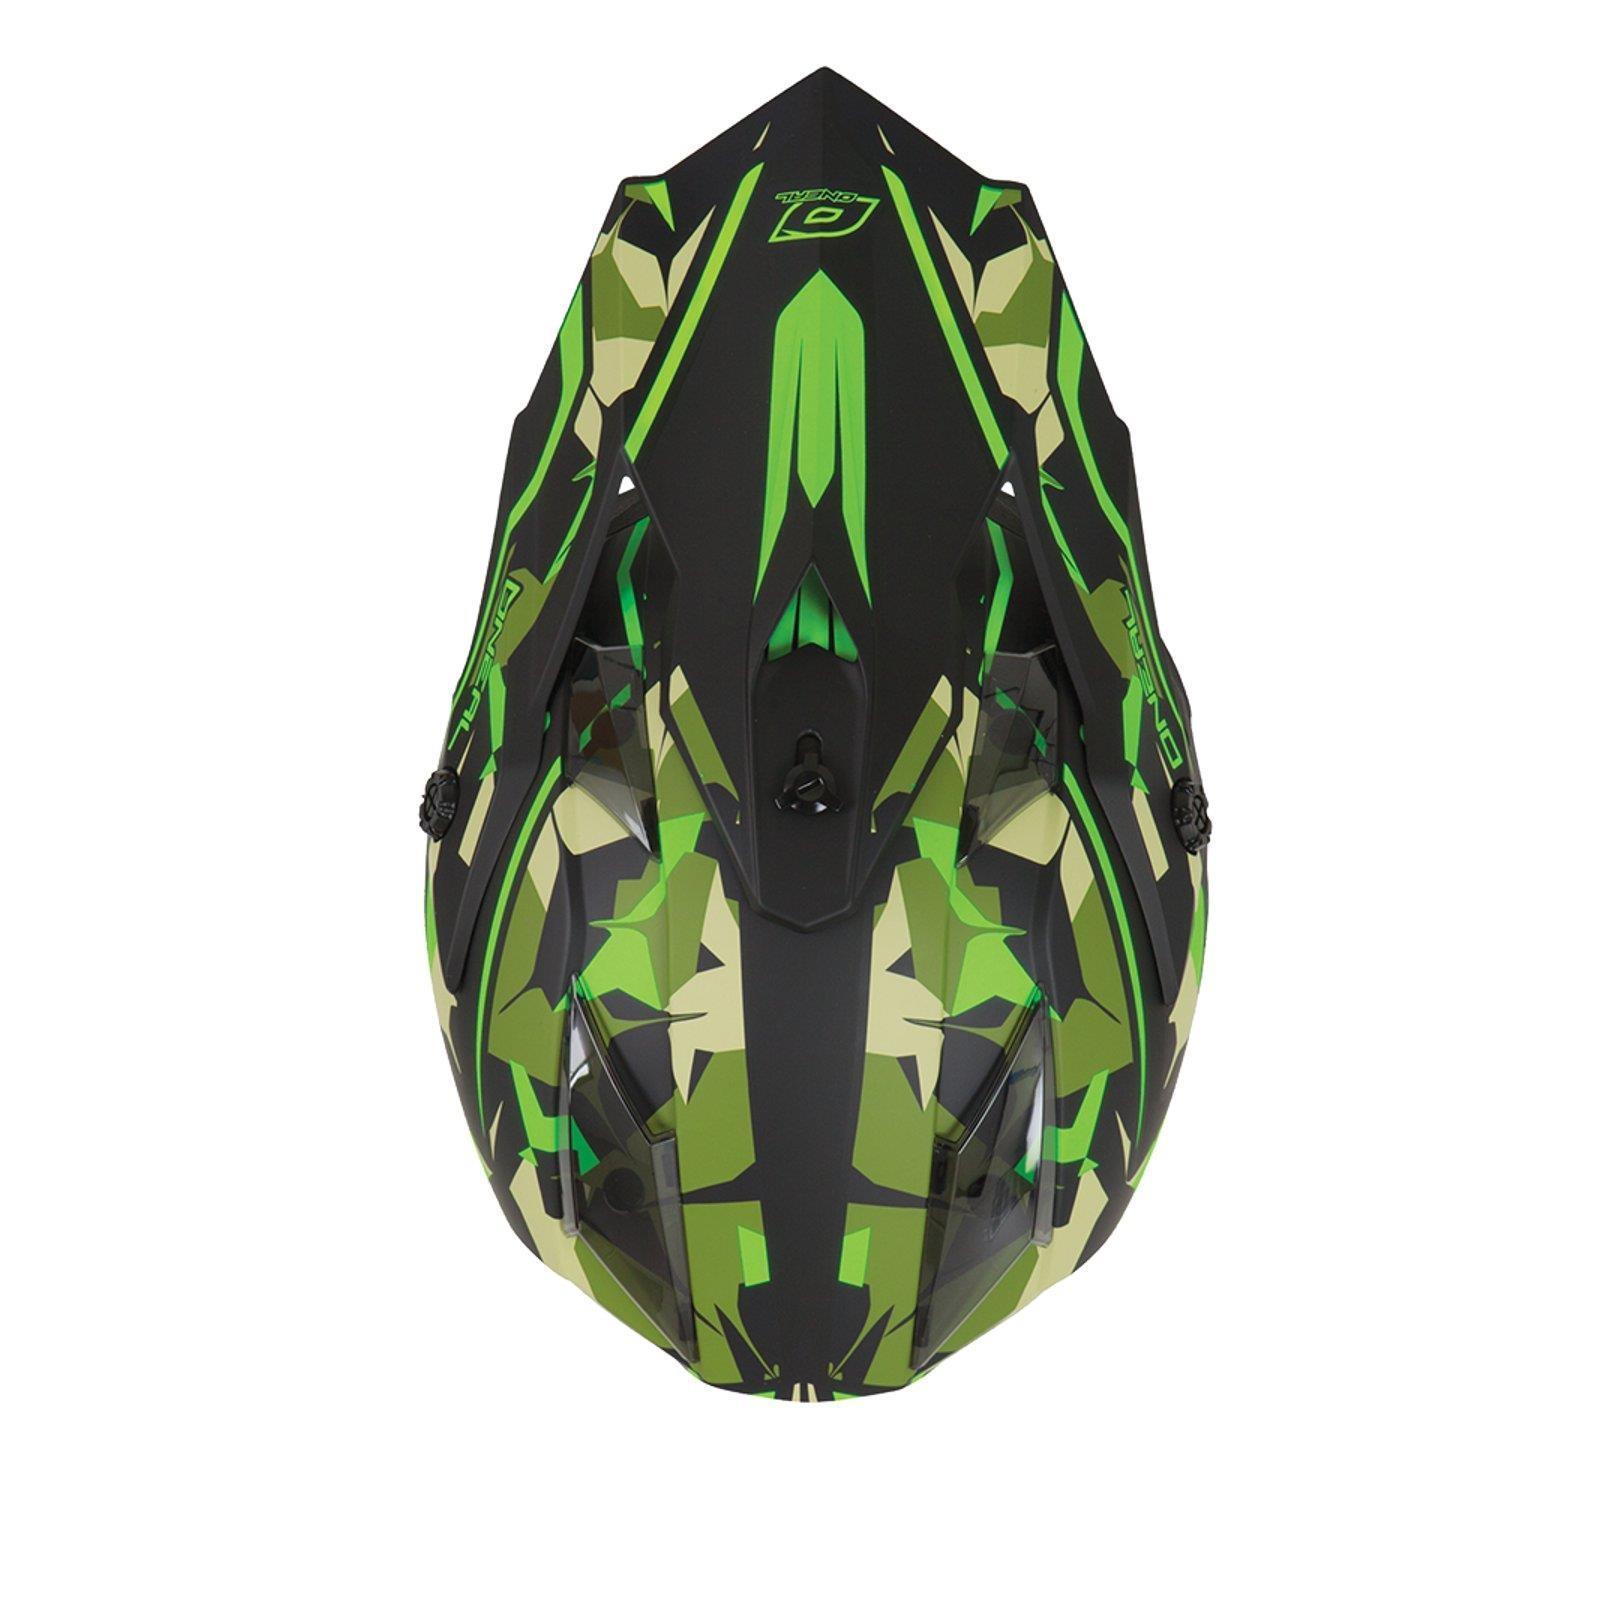 ONeal-Motocross-casco-MX-ENDURO-MOTO-BICI-FUORISTRADA-CROSS-Series-Adventure miniatura 126